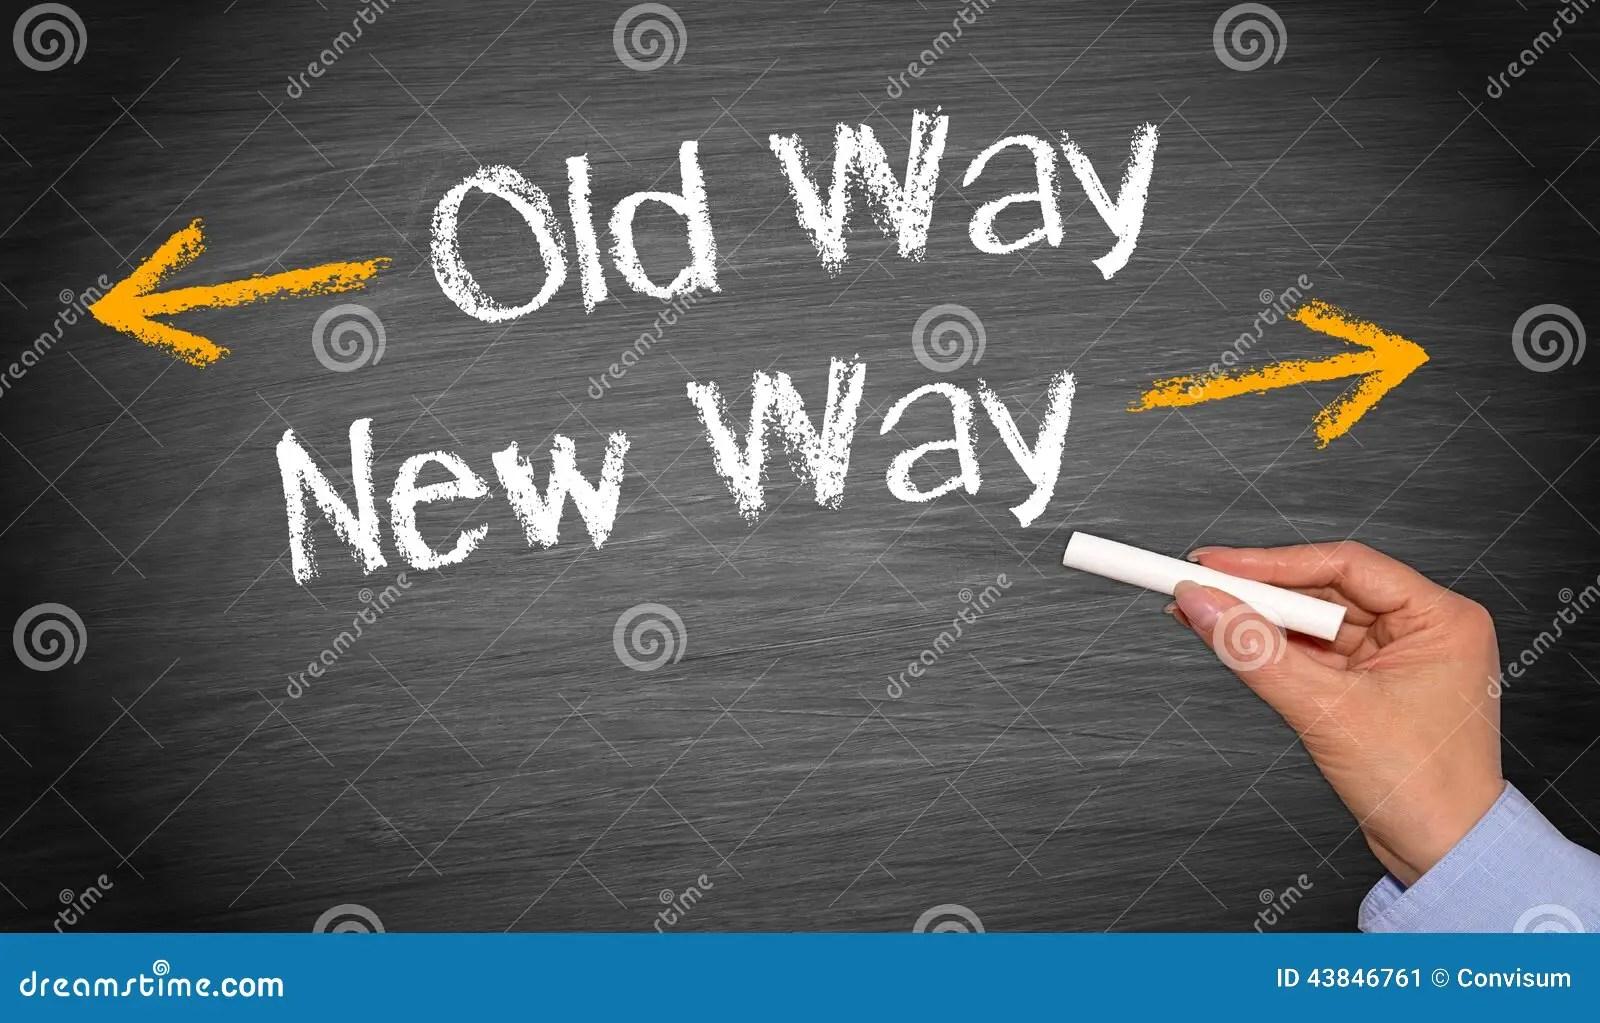 Old Way, New Way Stock Photo  Image 43846761